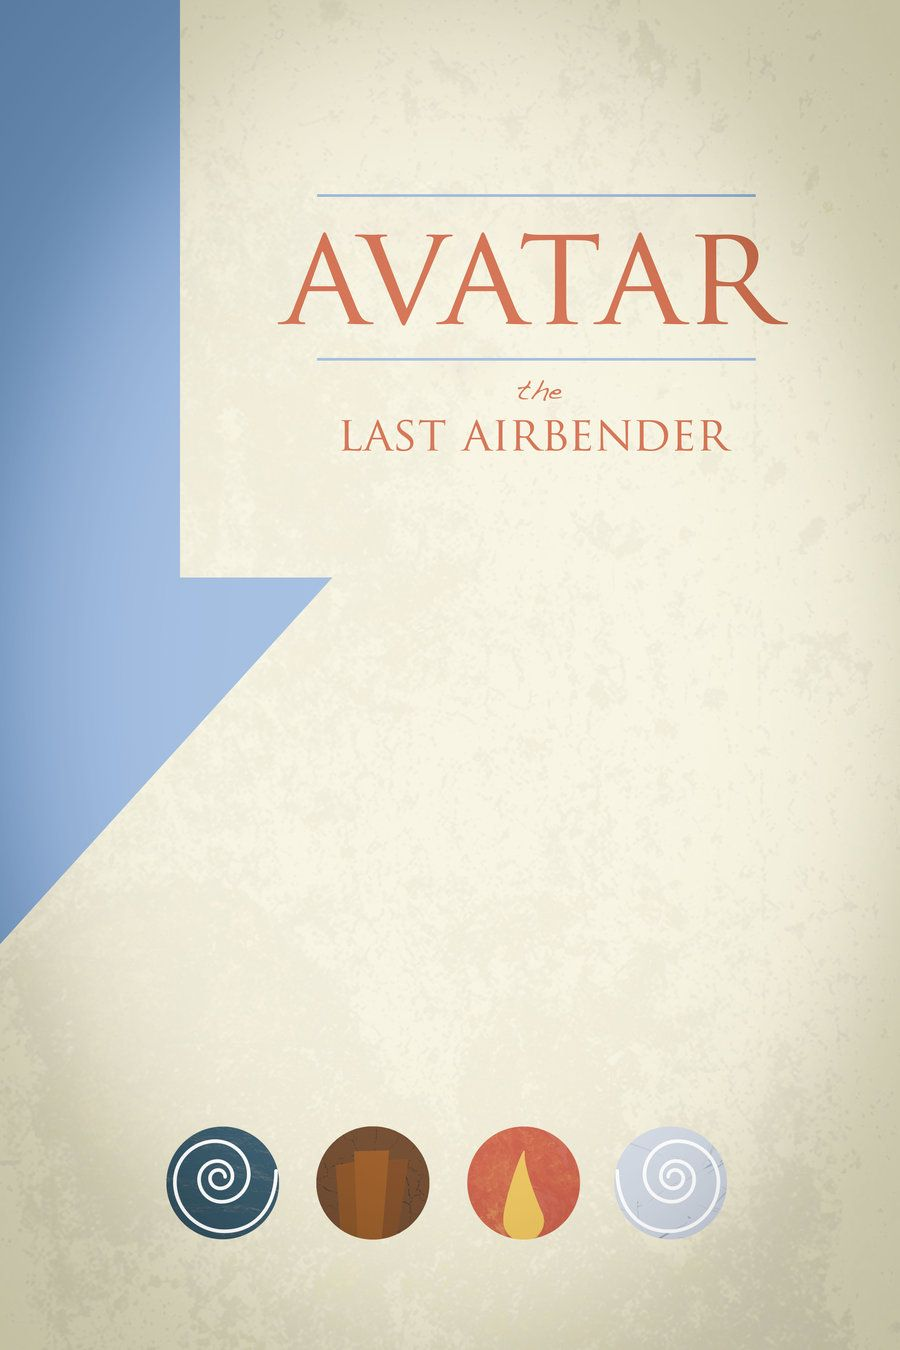 Minimalist Avatar The Last Airbender Poster By Enlou The Last Airbender Avatar The Last Airbender Avatar Movie